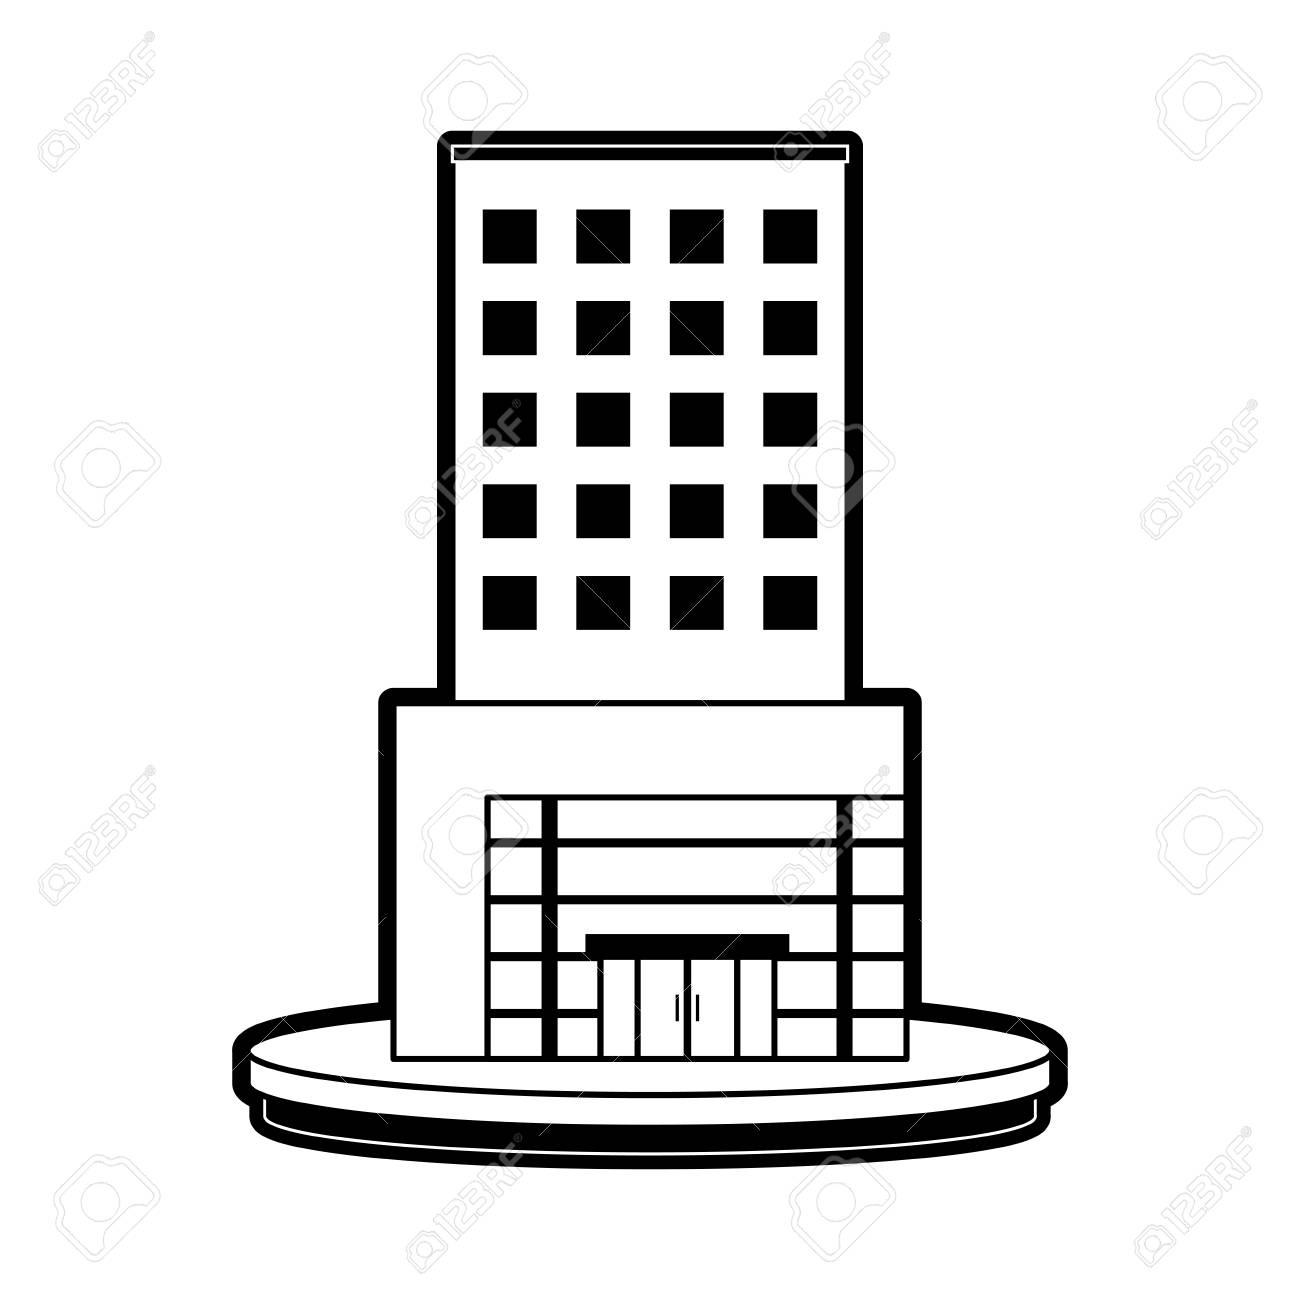 big city building icon image vector illustration design black...